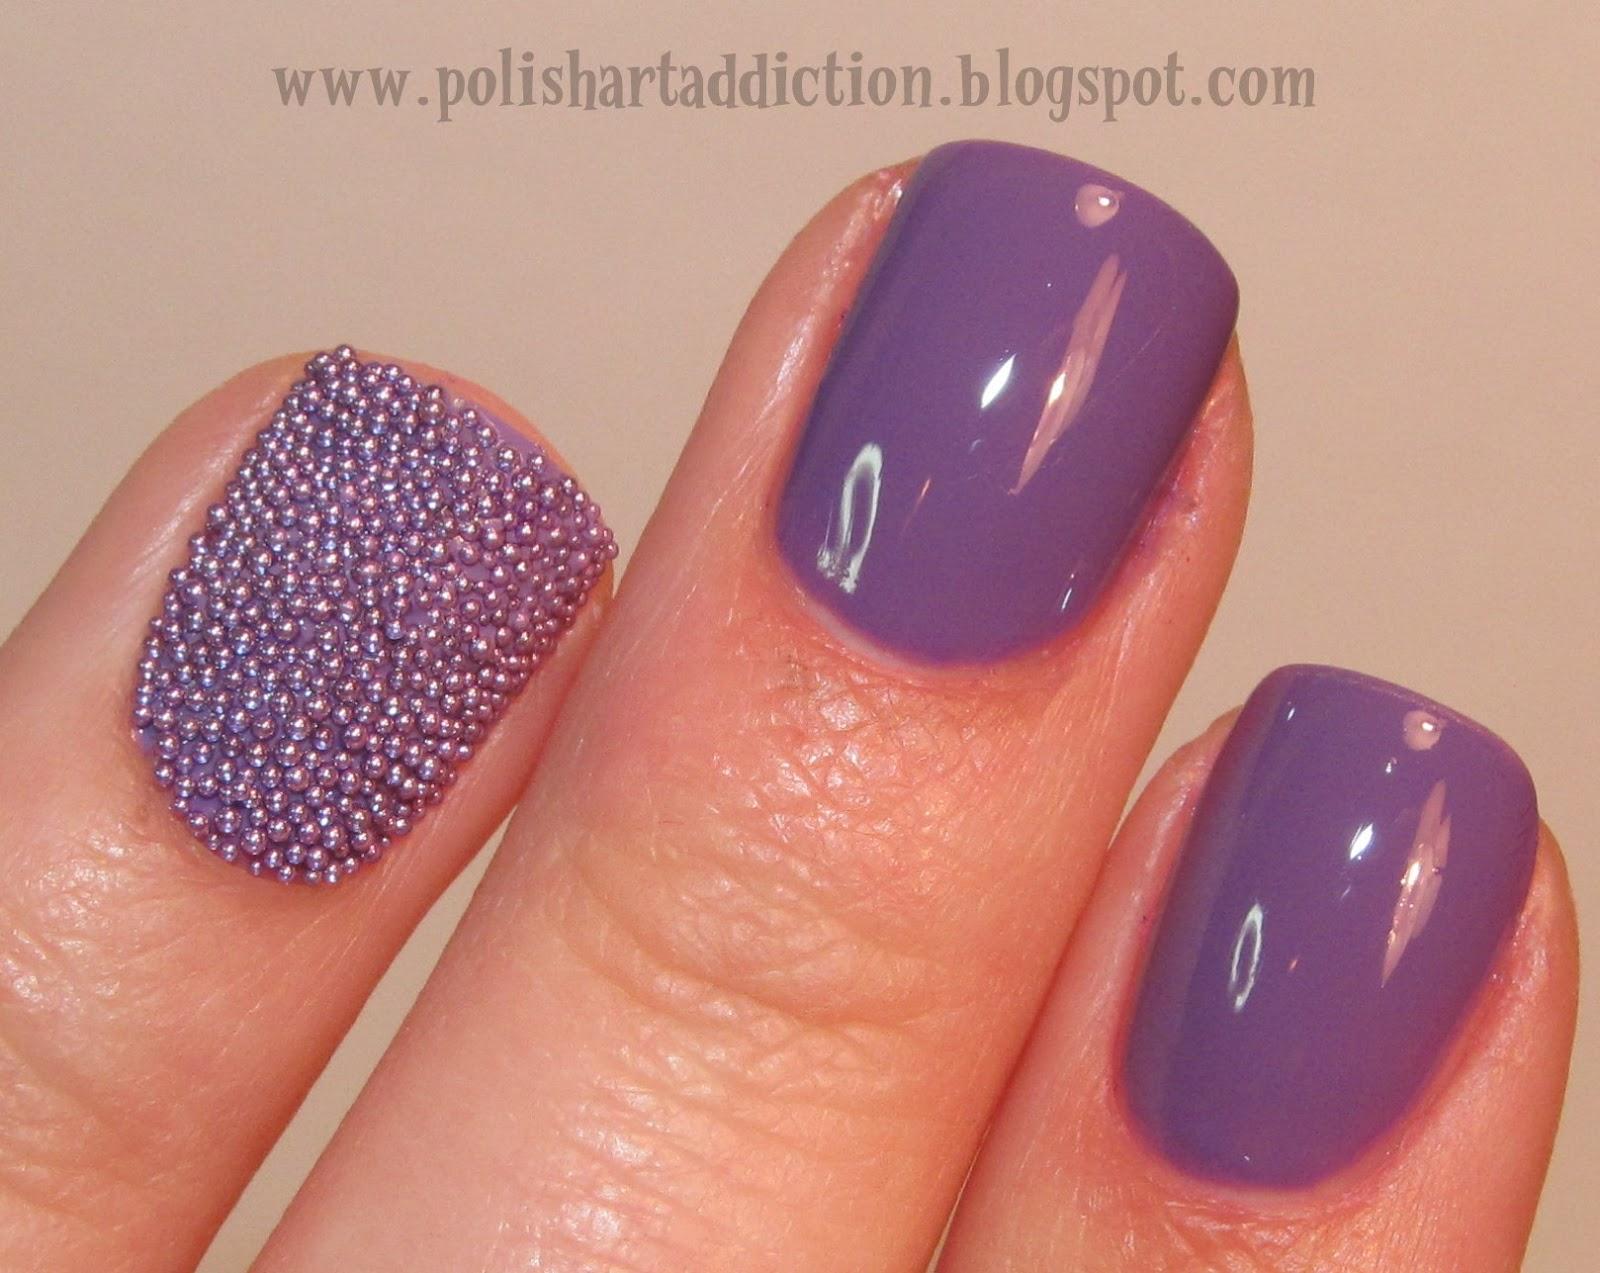 Novelty Nails - Microbeads/Fish Eggs